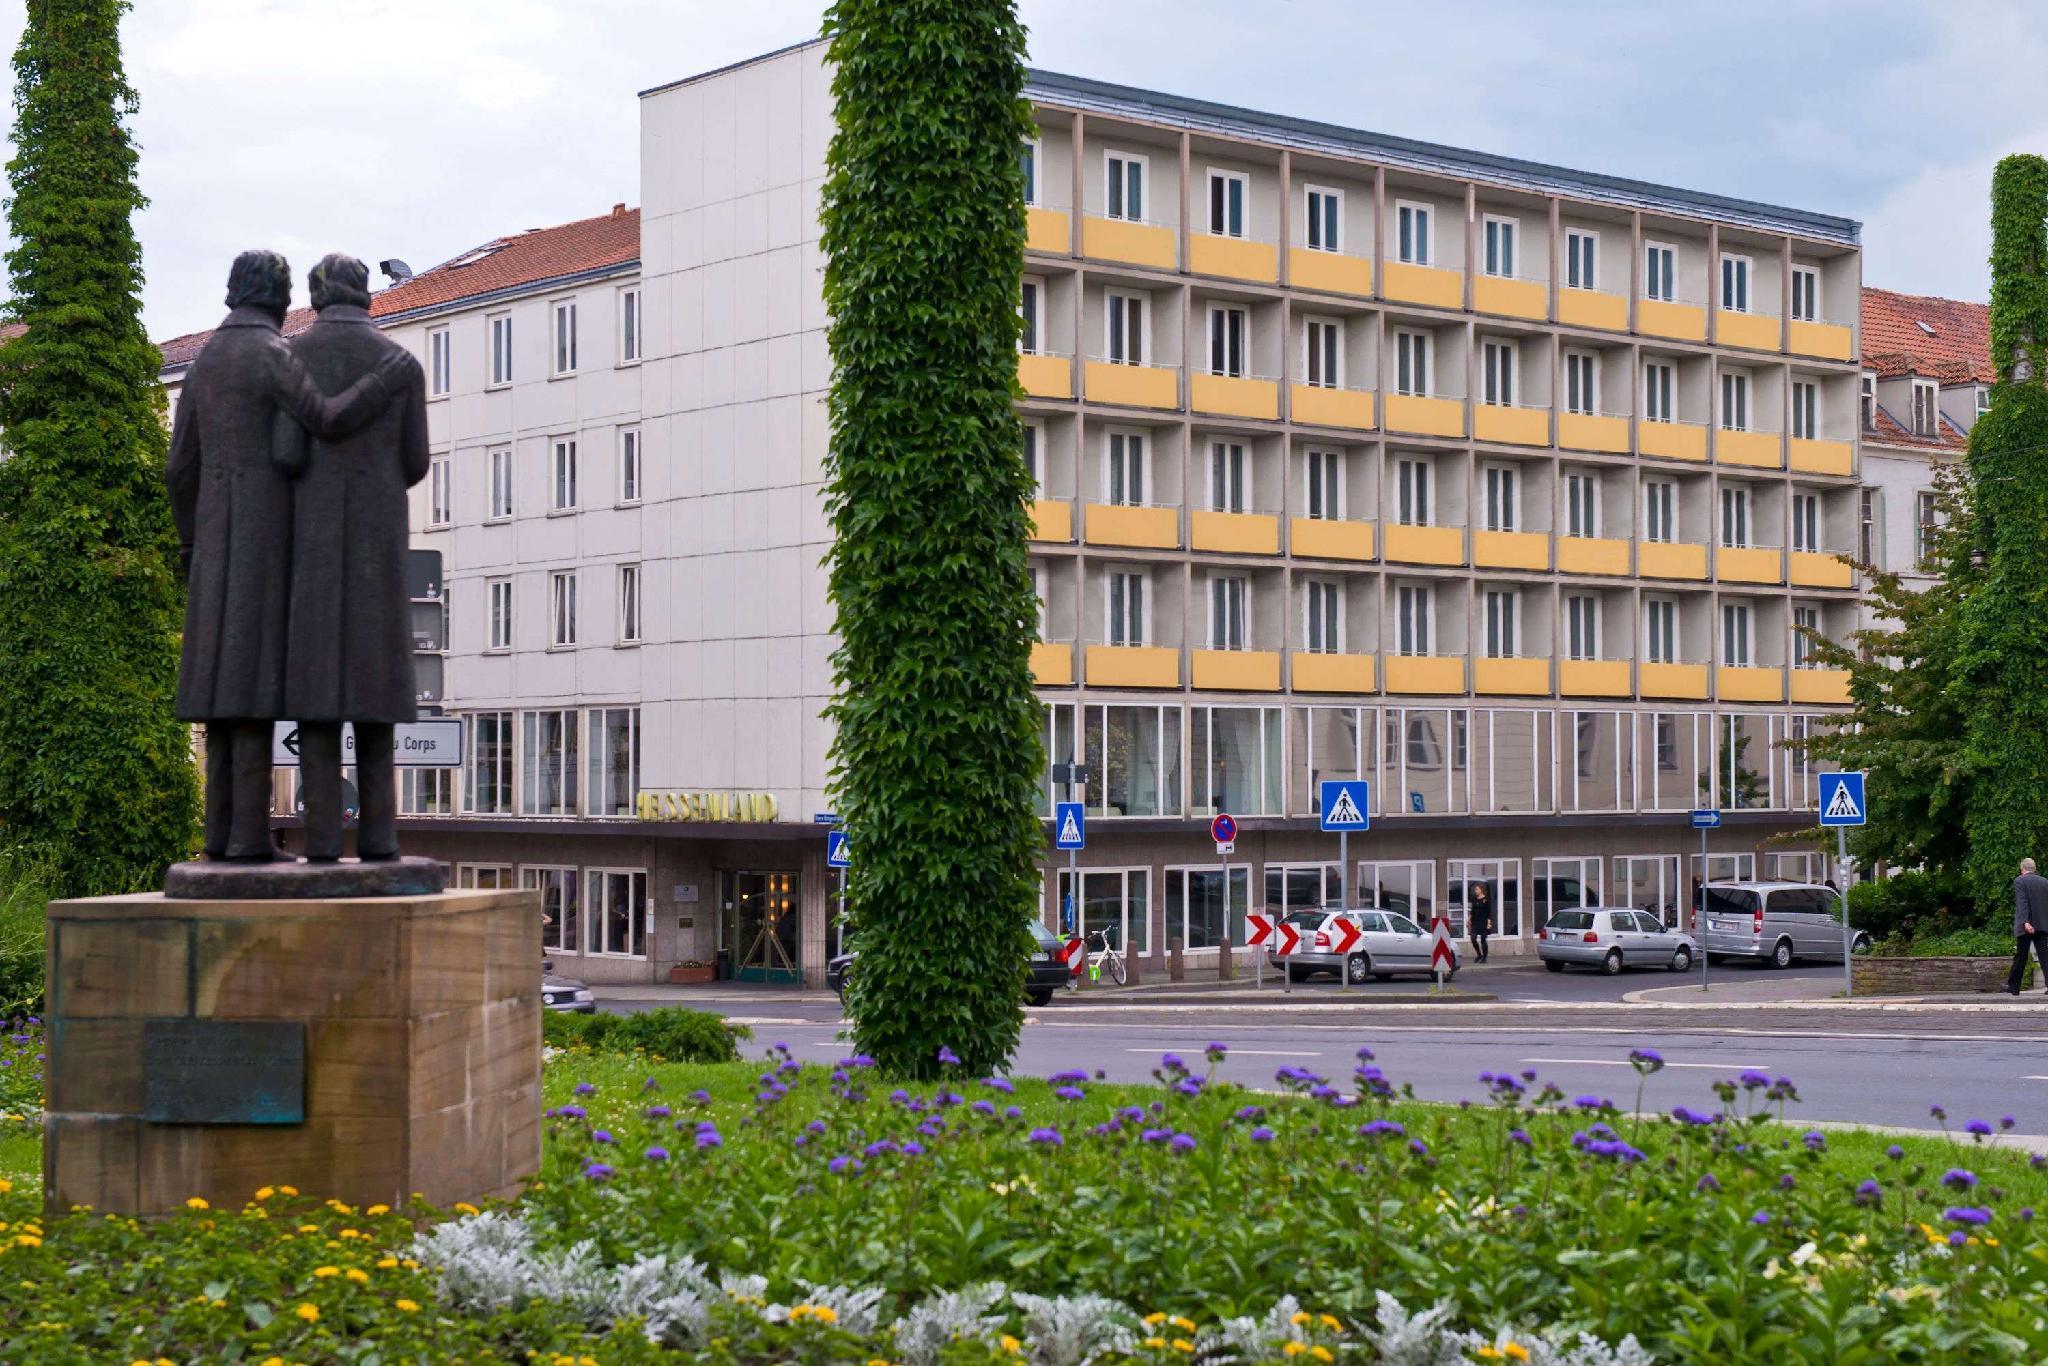 Days Inn by Wyndham Kassel Hessenland, Kassel